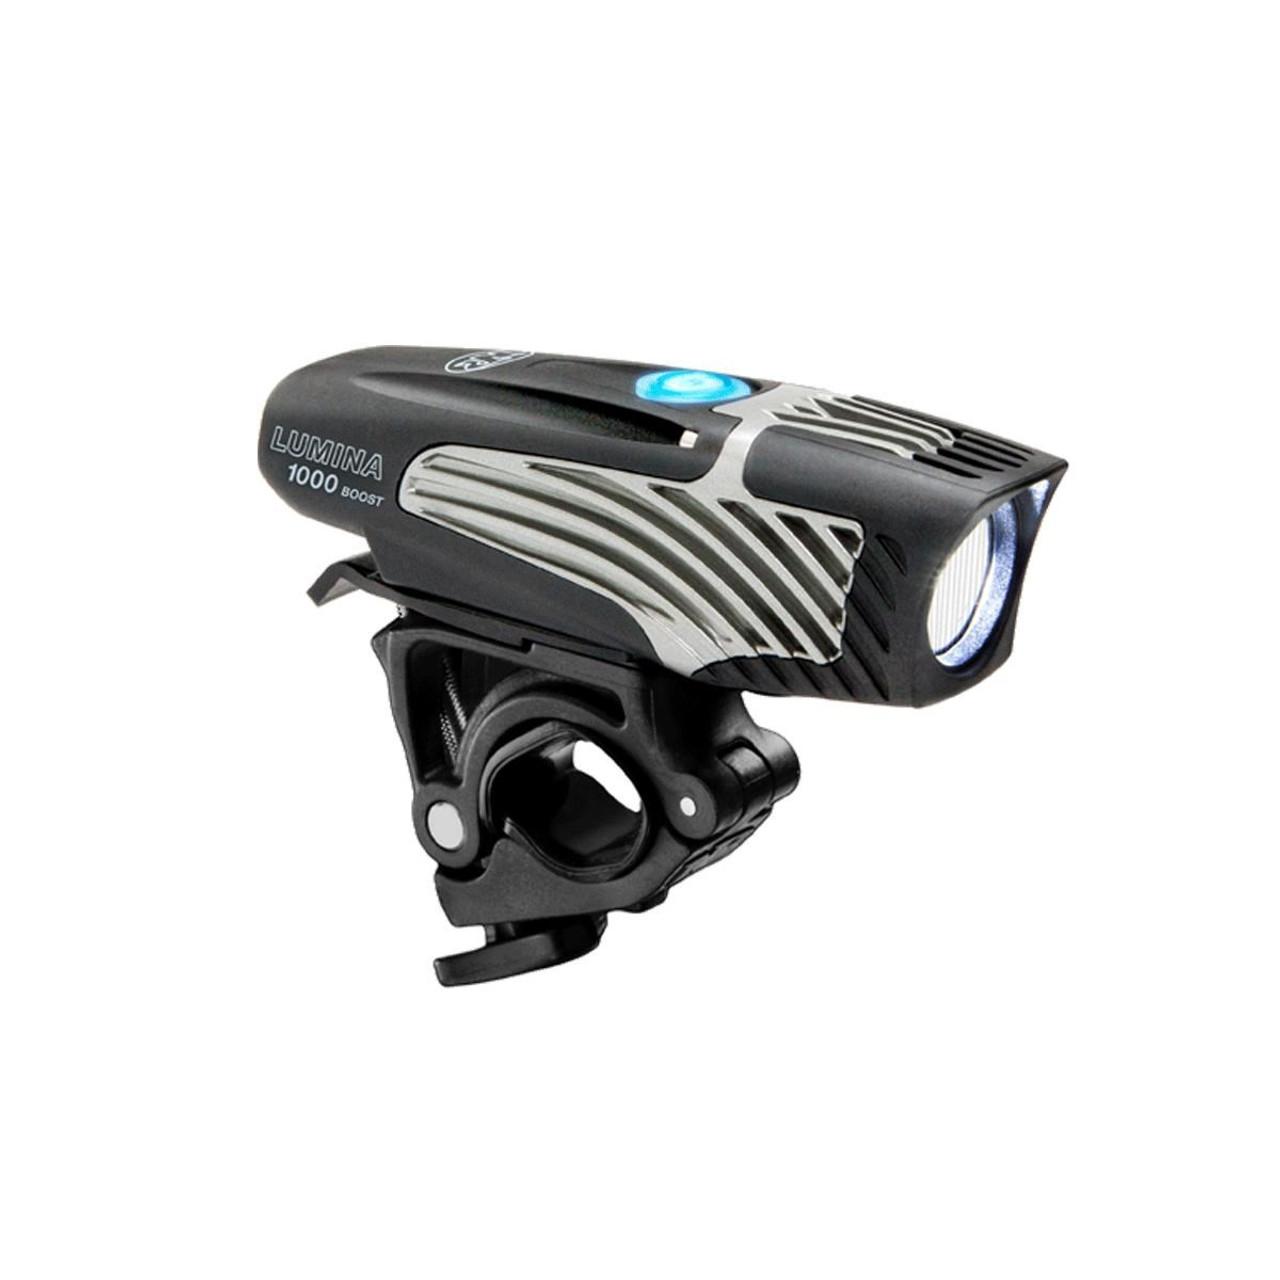 NiteRider Lumina 1000 Boost LED Front Light